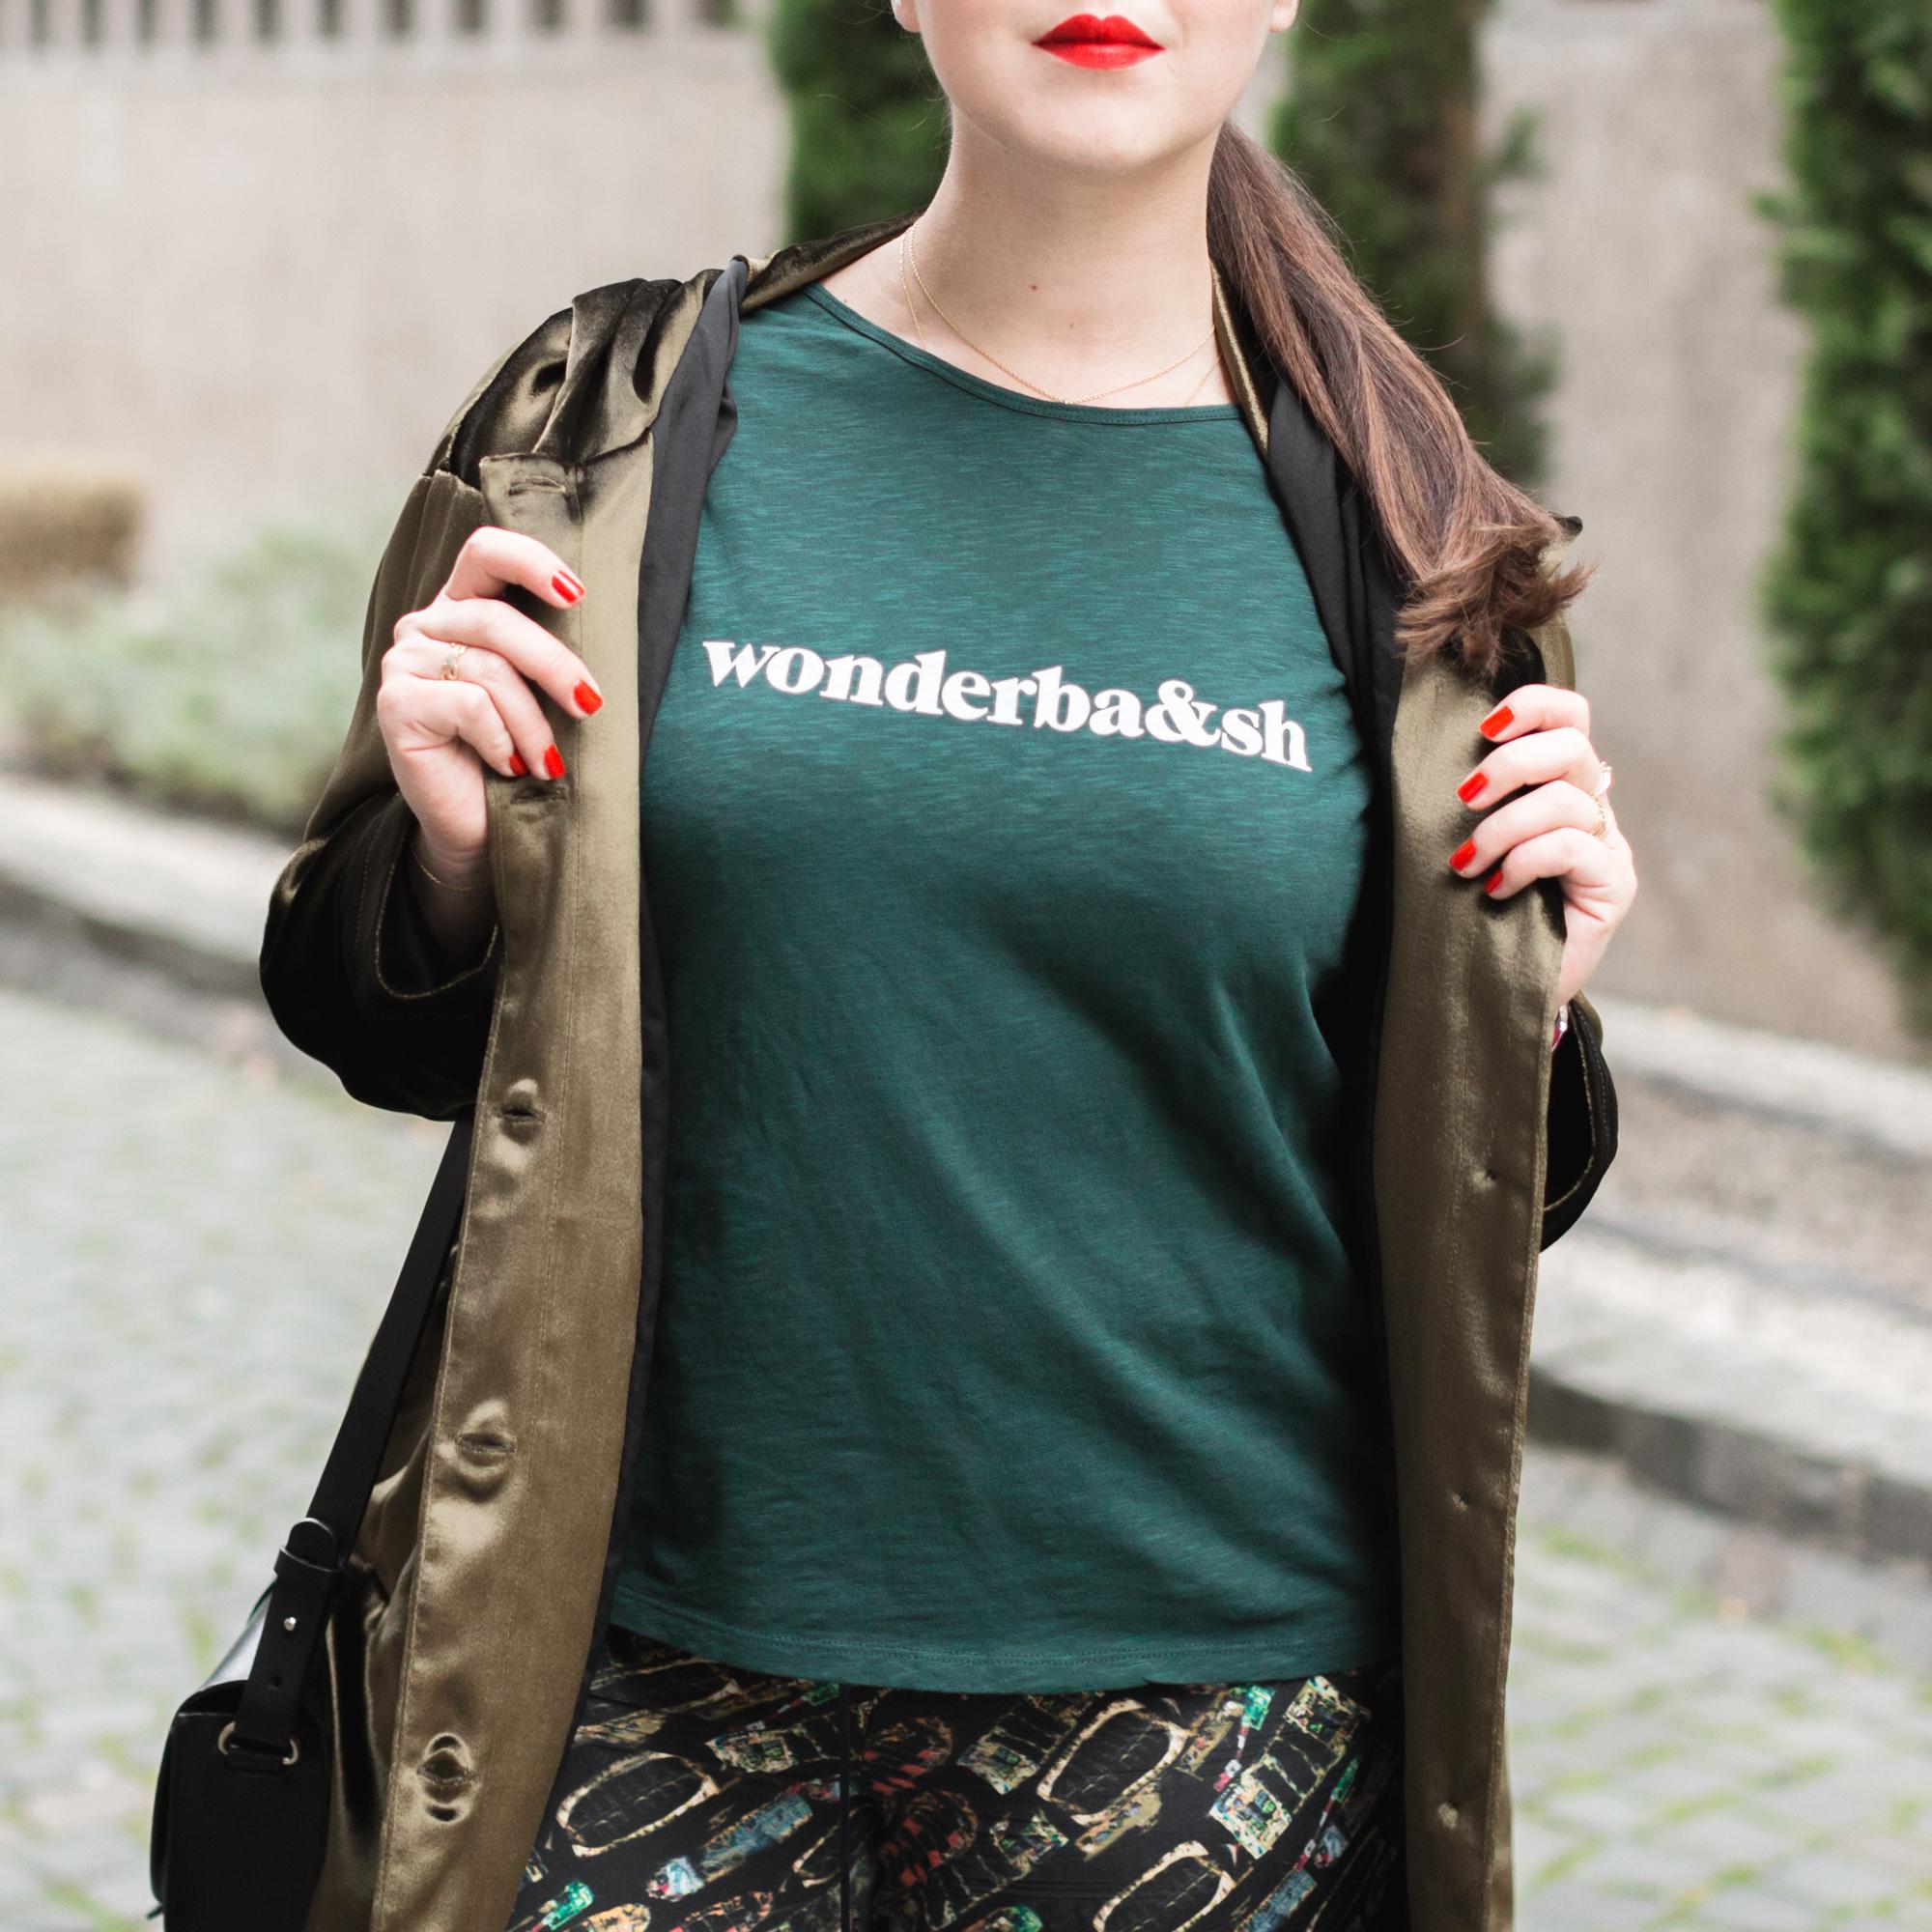 2000-wonderbash-parka-ikks-velours-pantalon-heimstone-copyright-pauline-paulinefashionblog-com-1